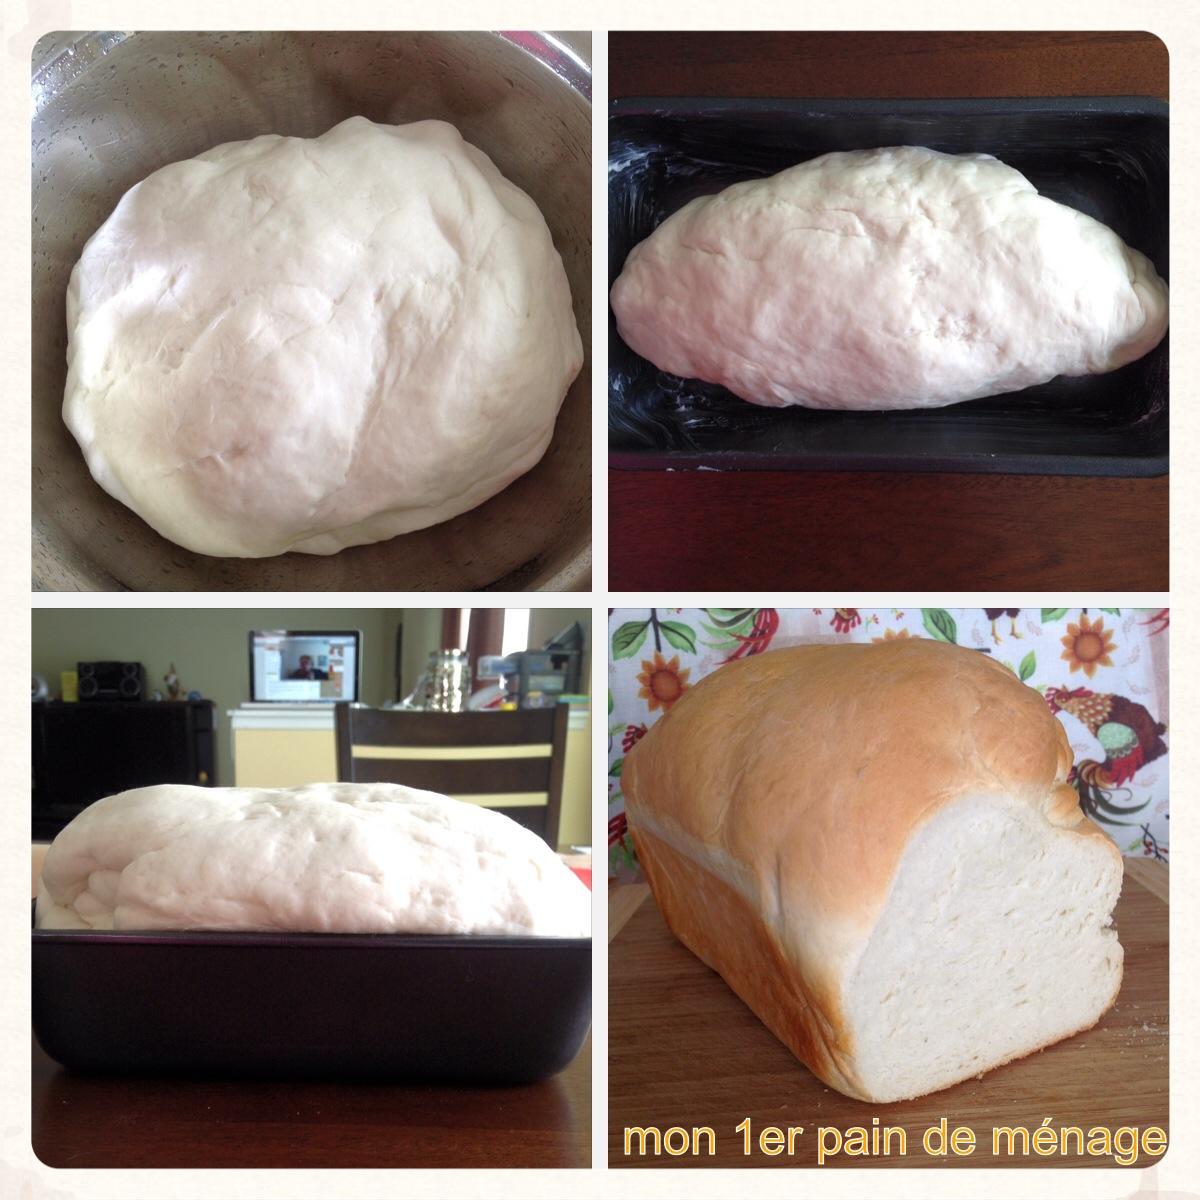 La cuisine de jos e pain de m nage ricardo for Articles de cuisine de ricardo